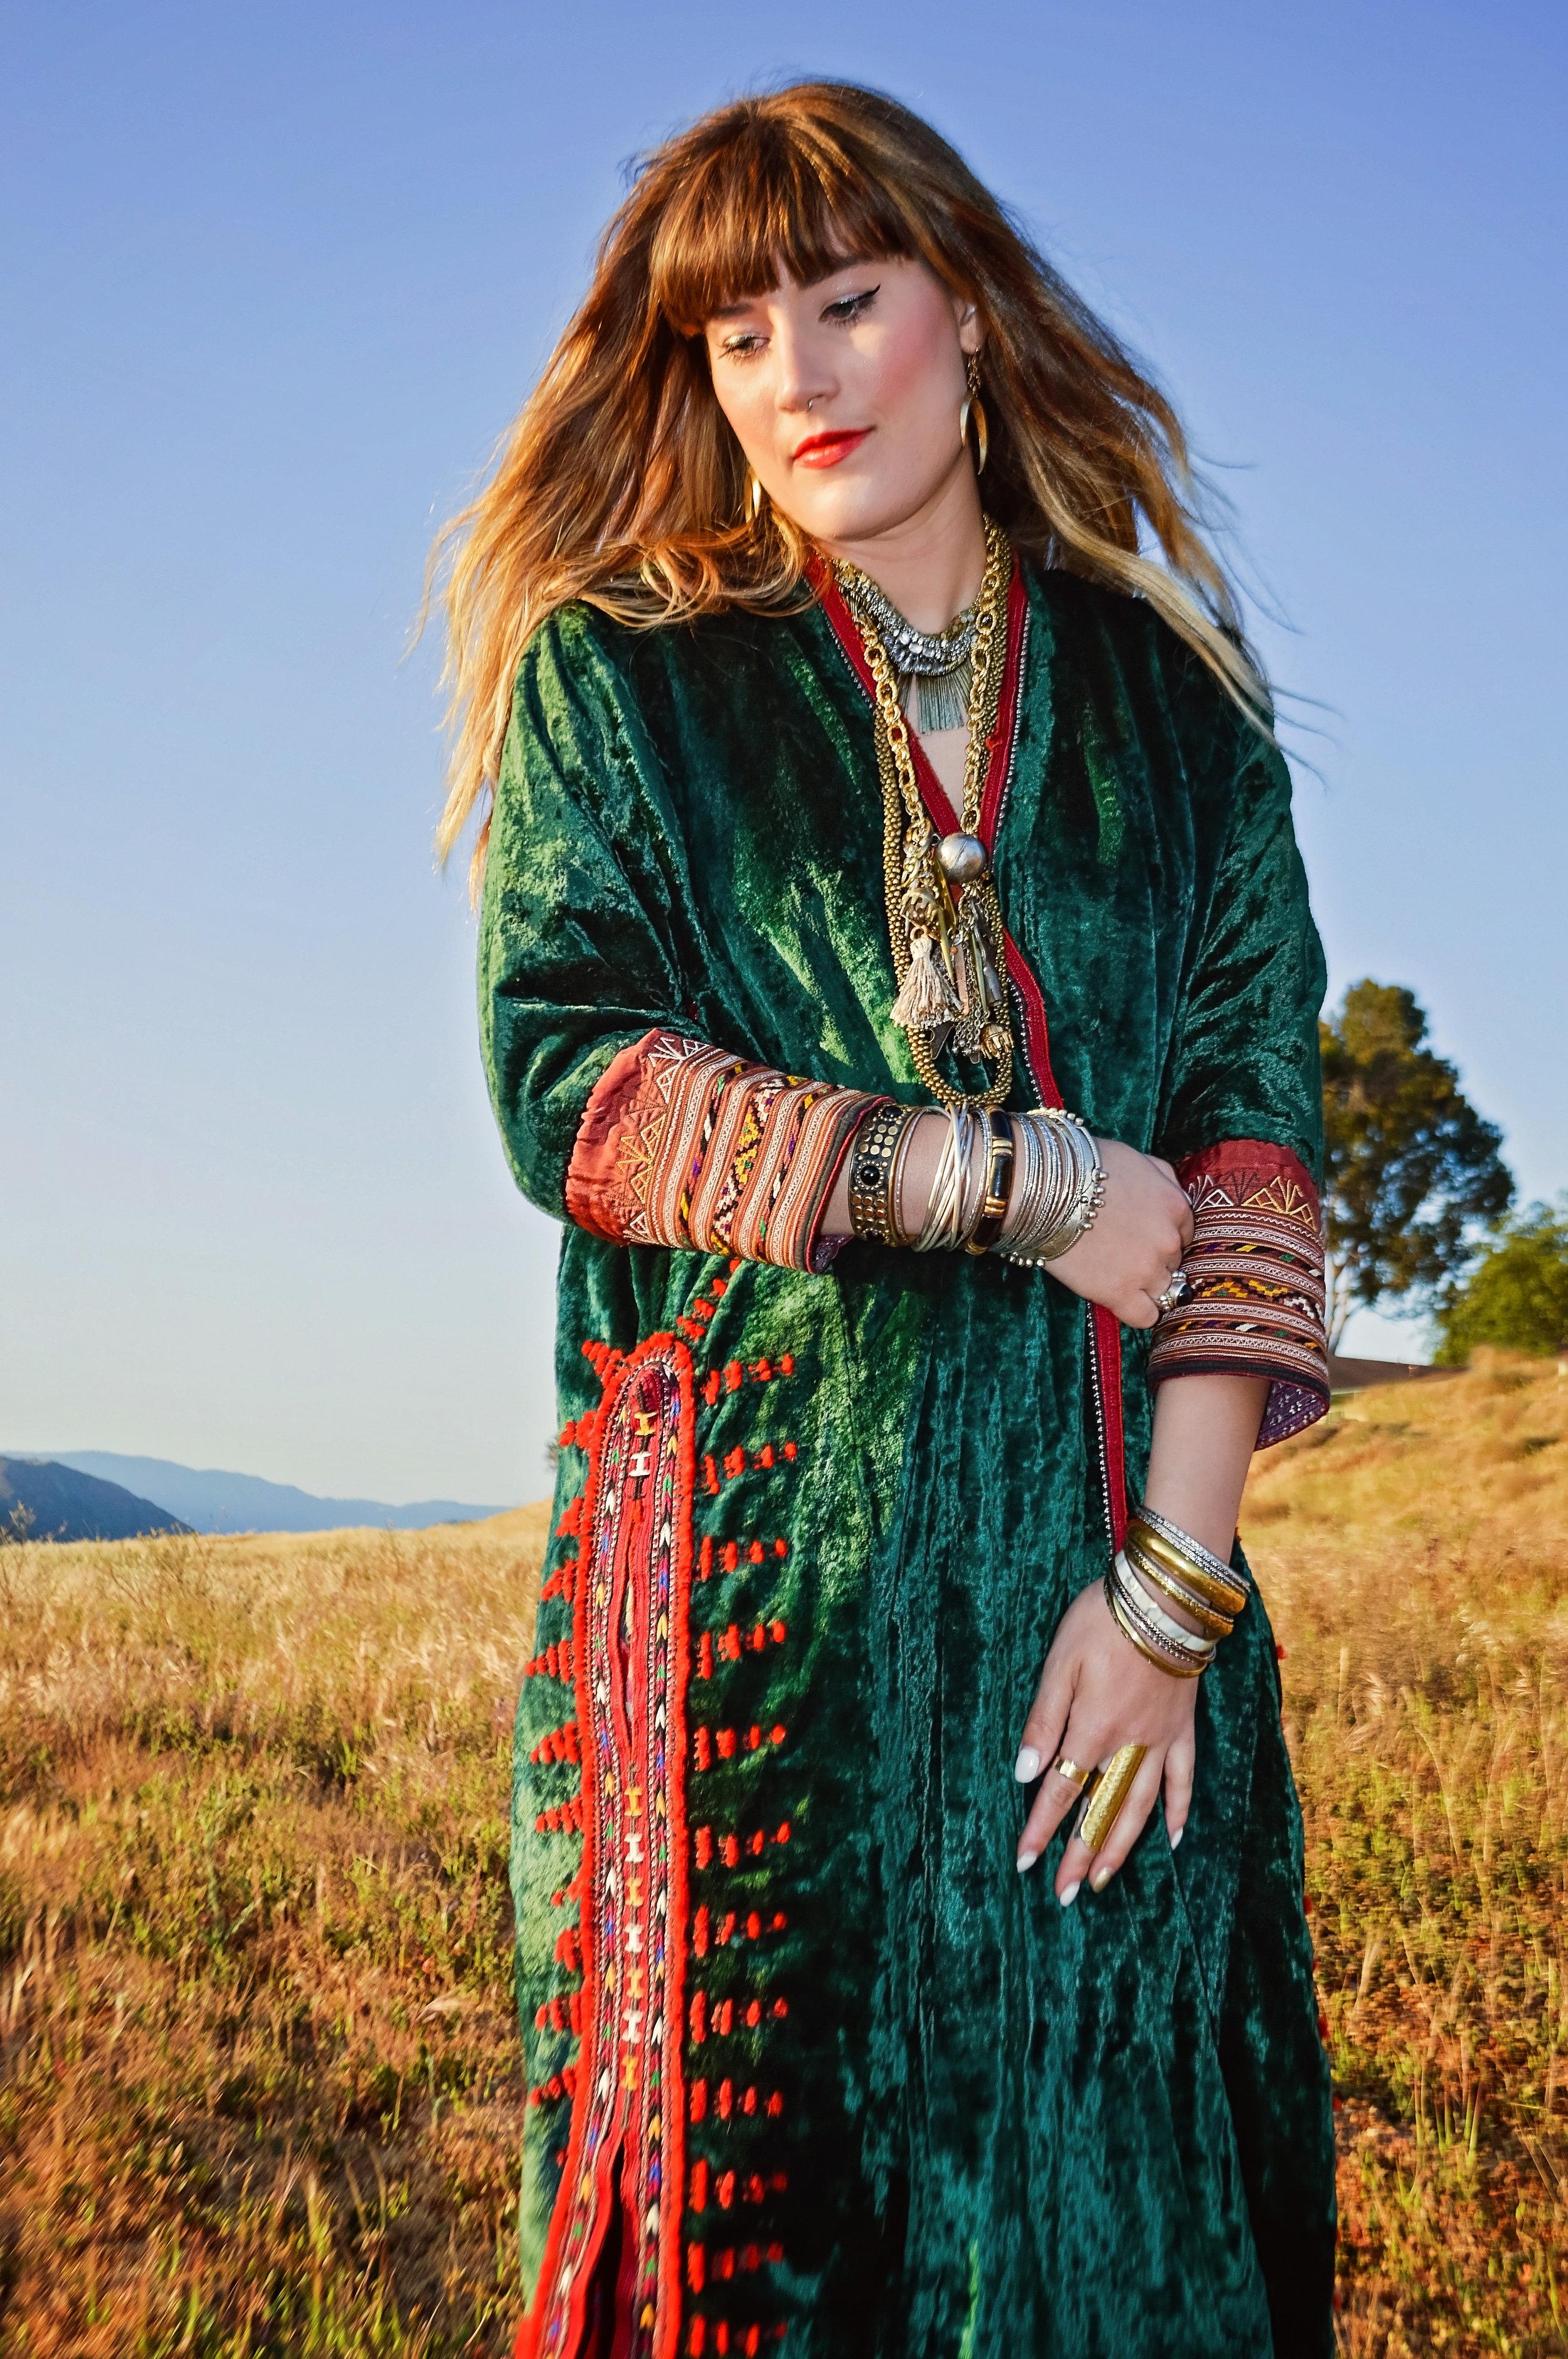 Fashion Dress Jewelry | Fashion Photography | Lacey O | Washington DC